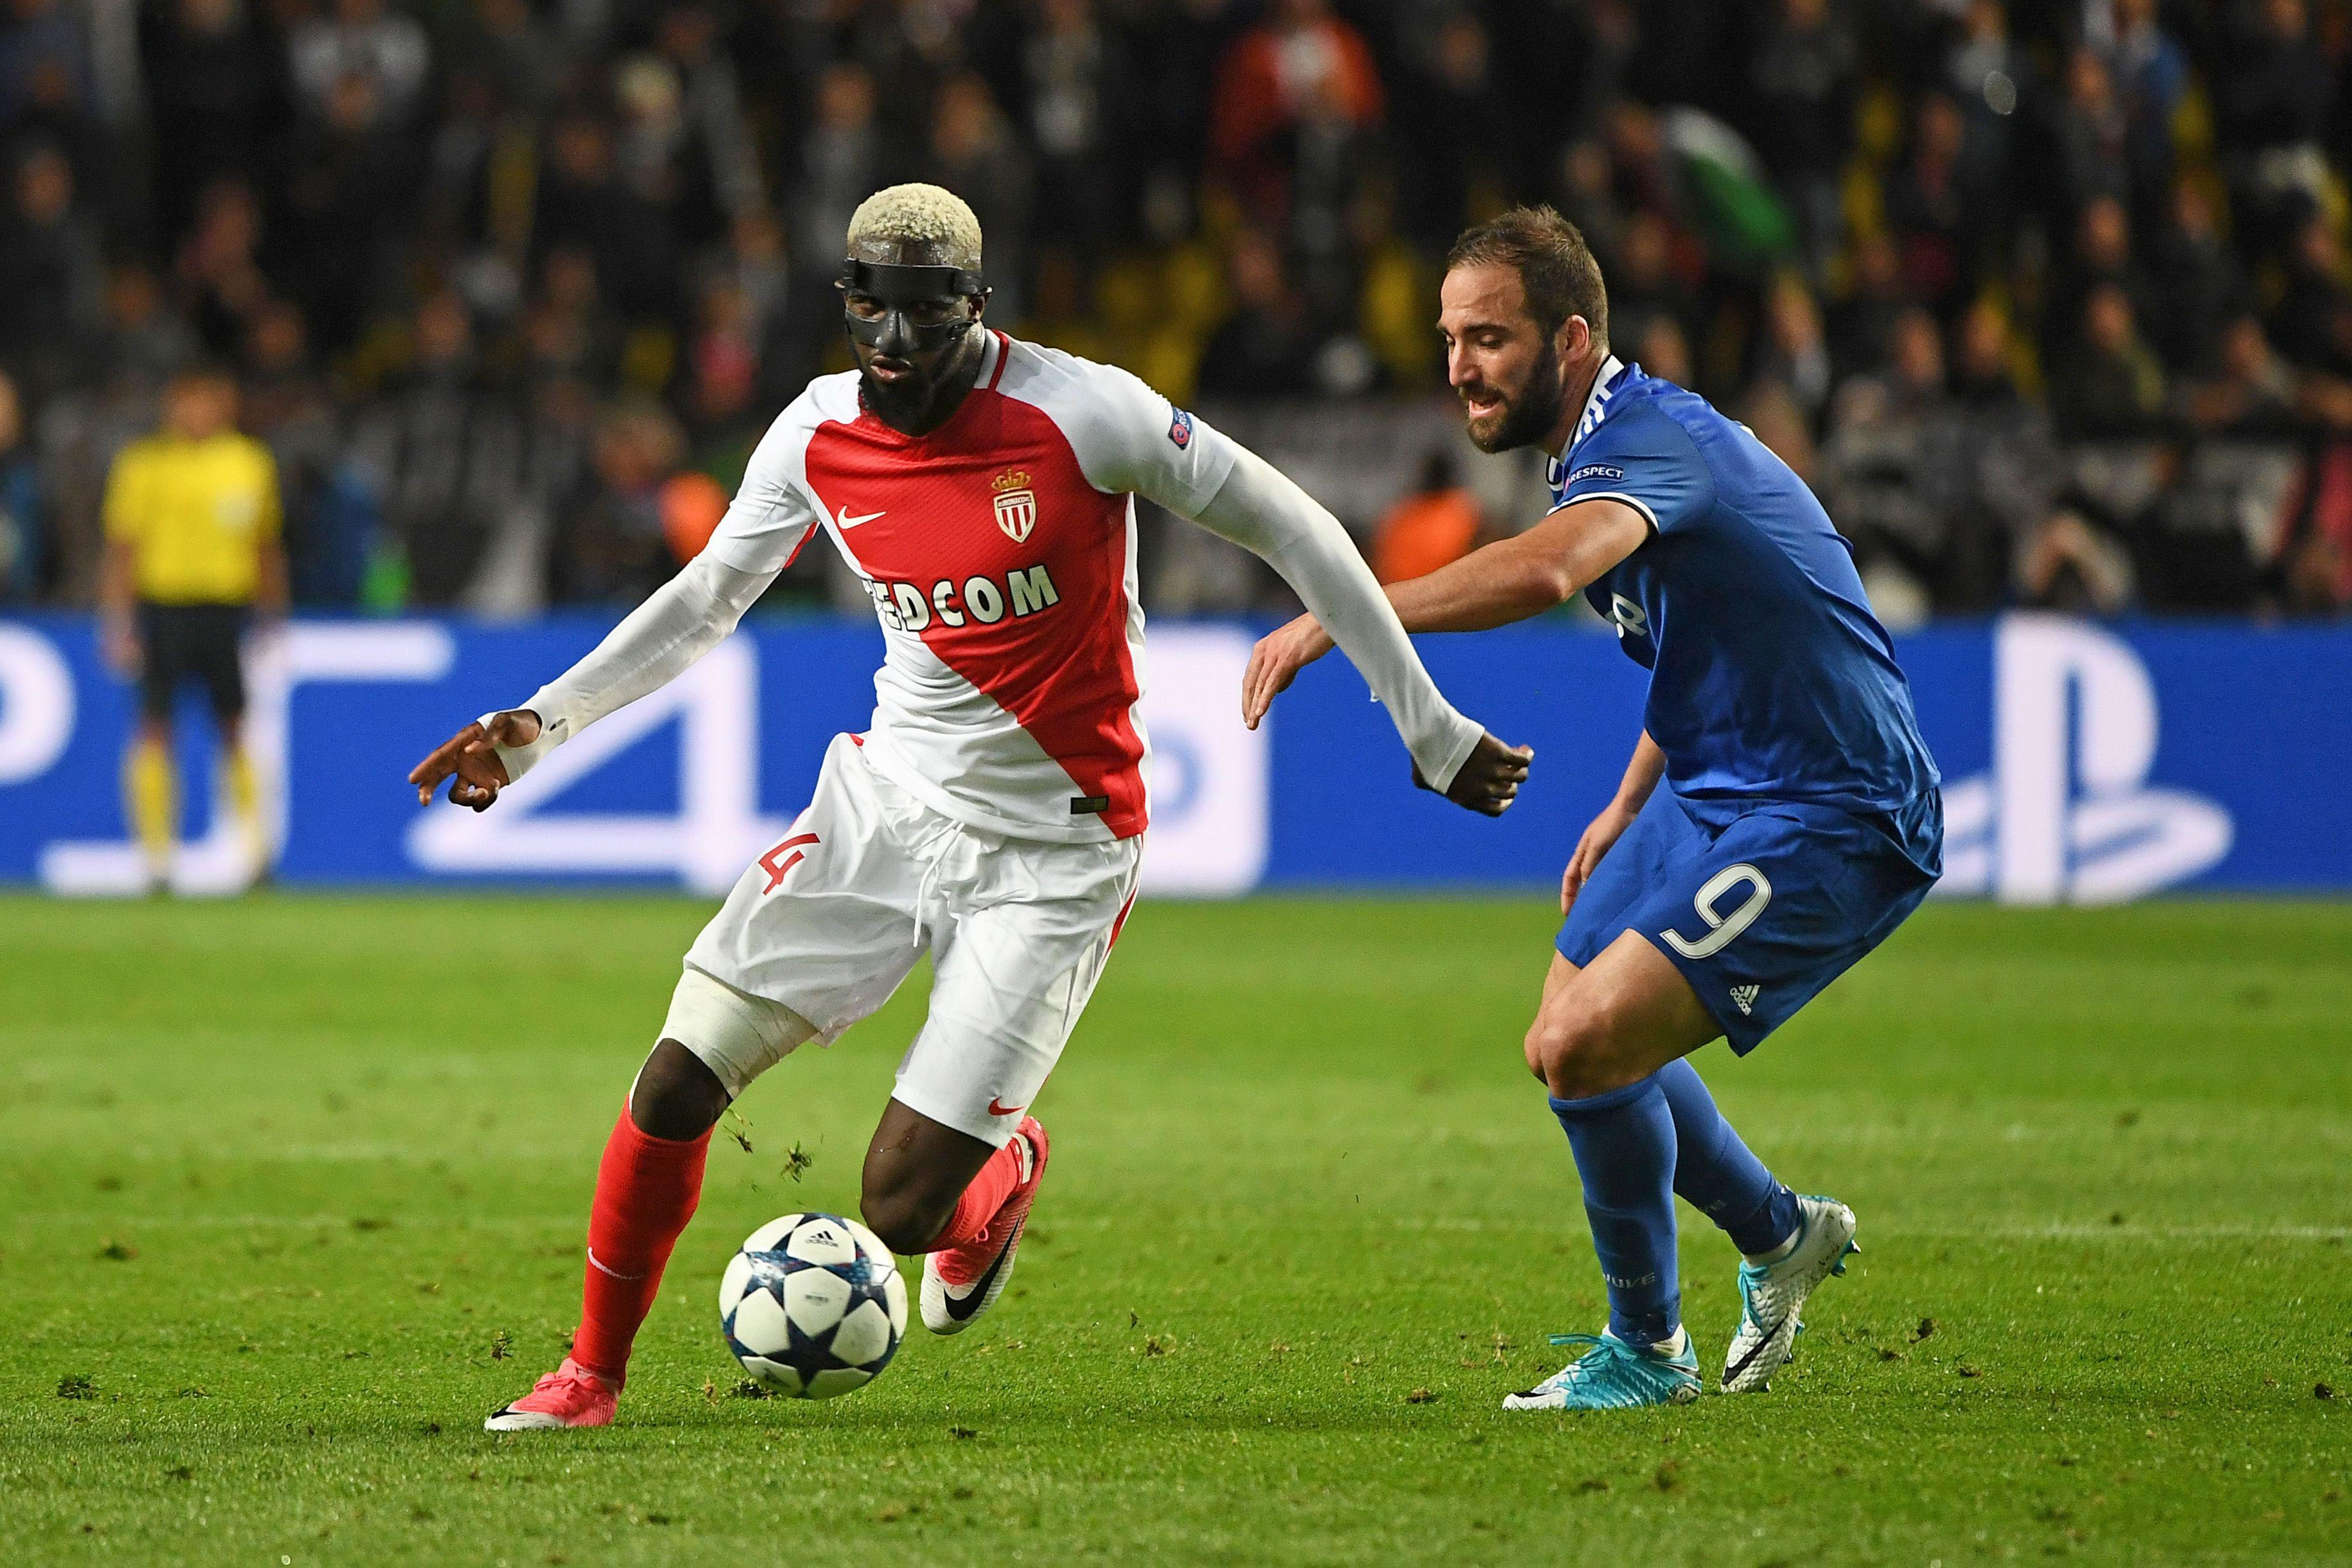 Tiemoue Bakayoko drifts past Gonzalo Higuain on Wednesday night